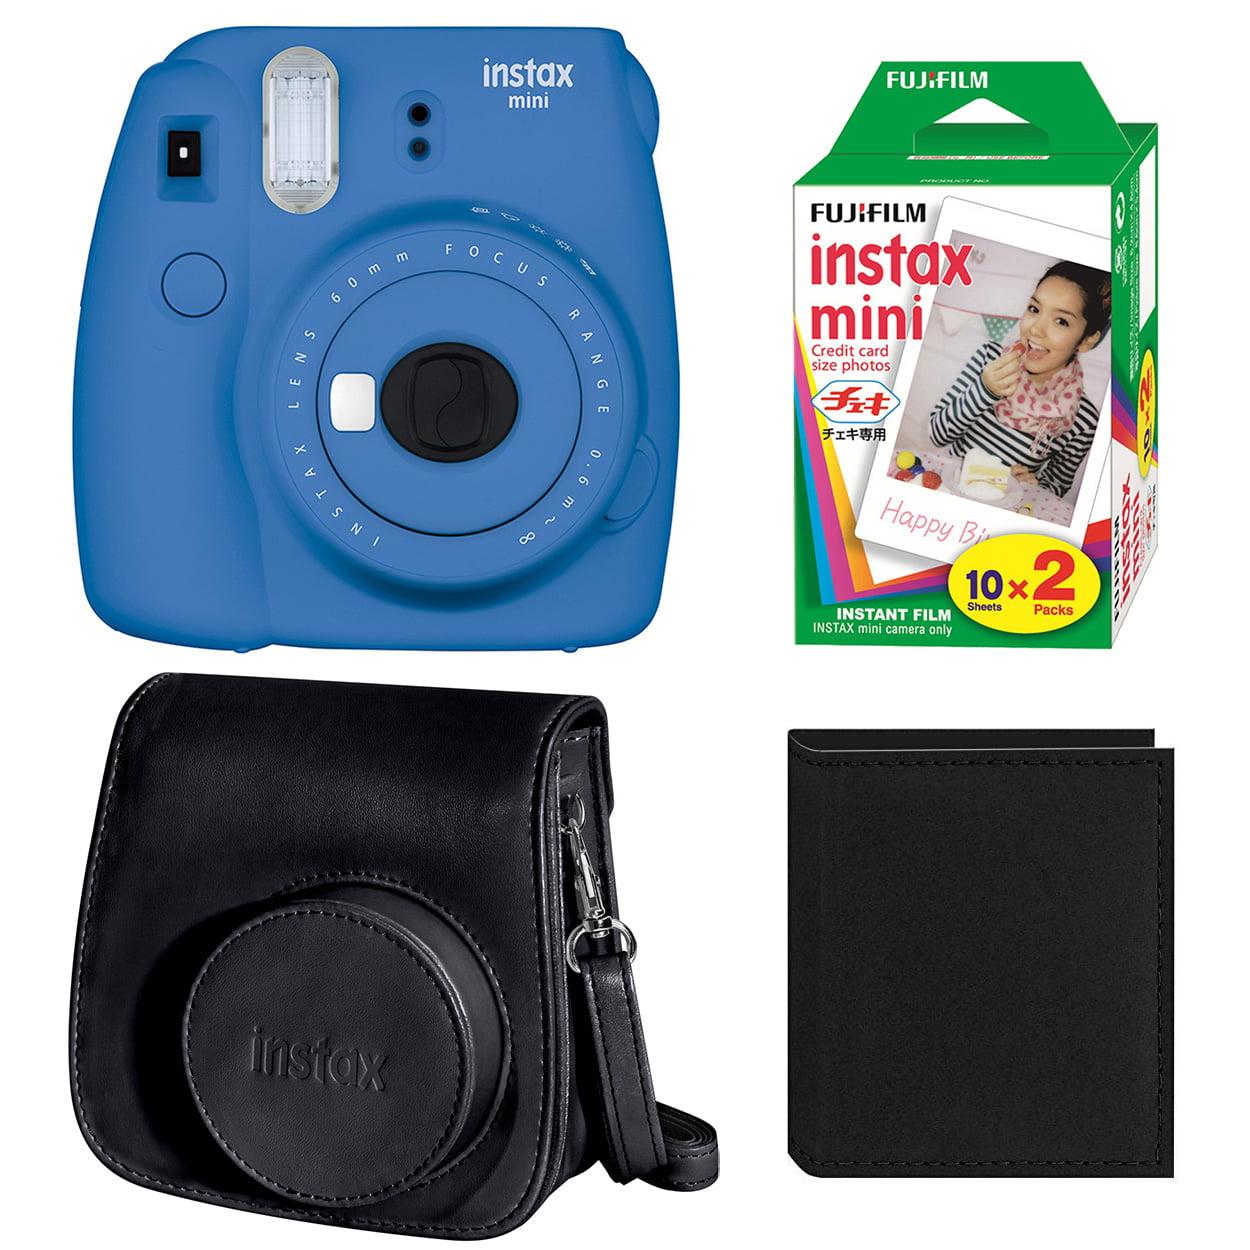 Fujifilm Instax Mini 9 Instant Film Camera (Cobalt Blue) + Film (2-Pack) + Accessory Bundle